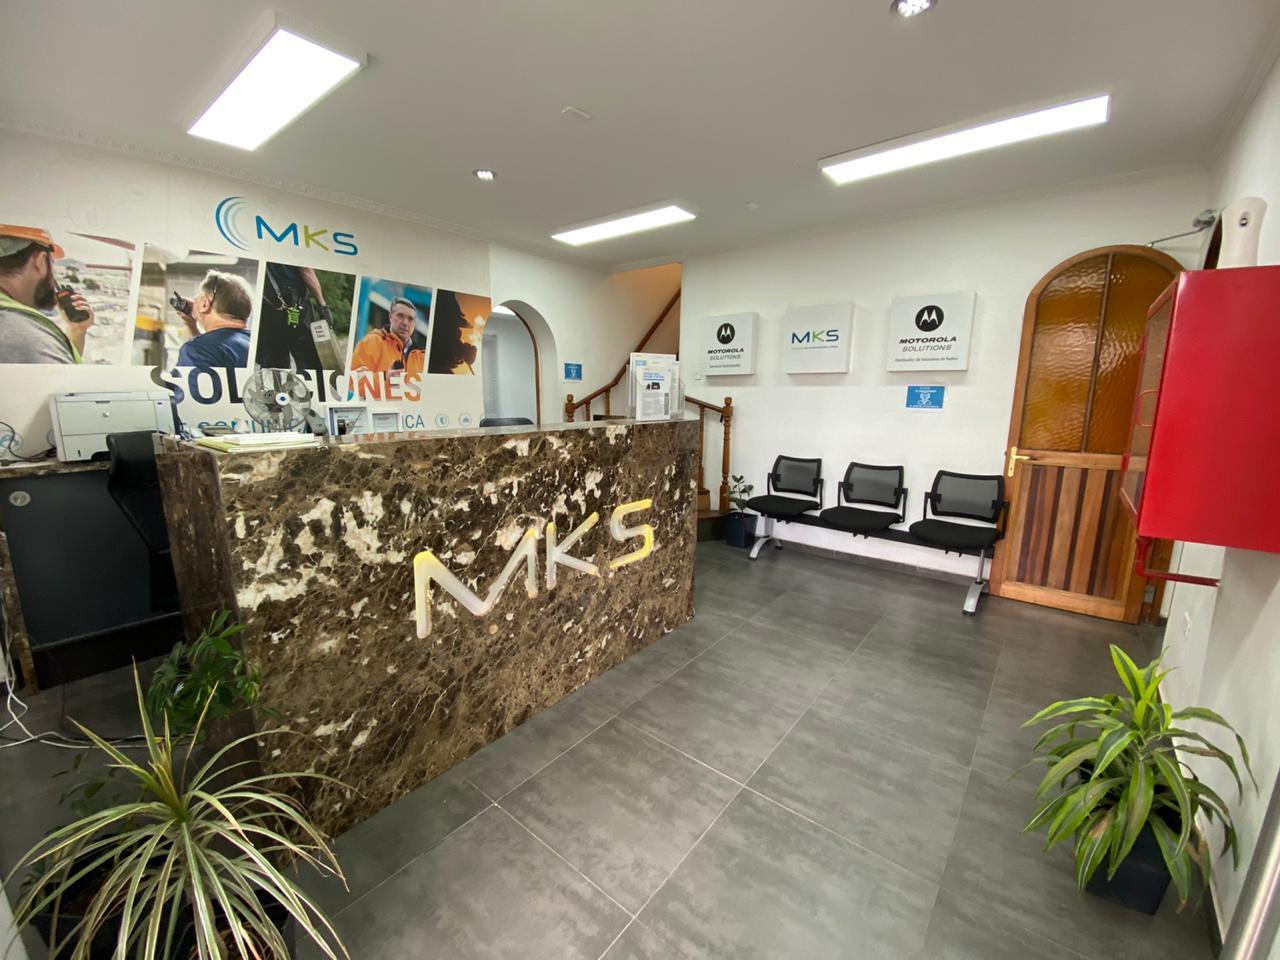 Centro de Servicios MKS